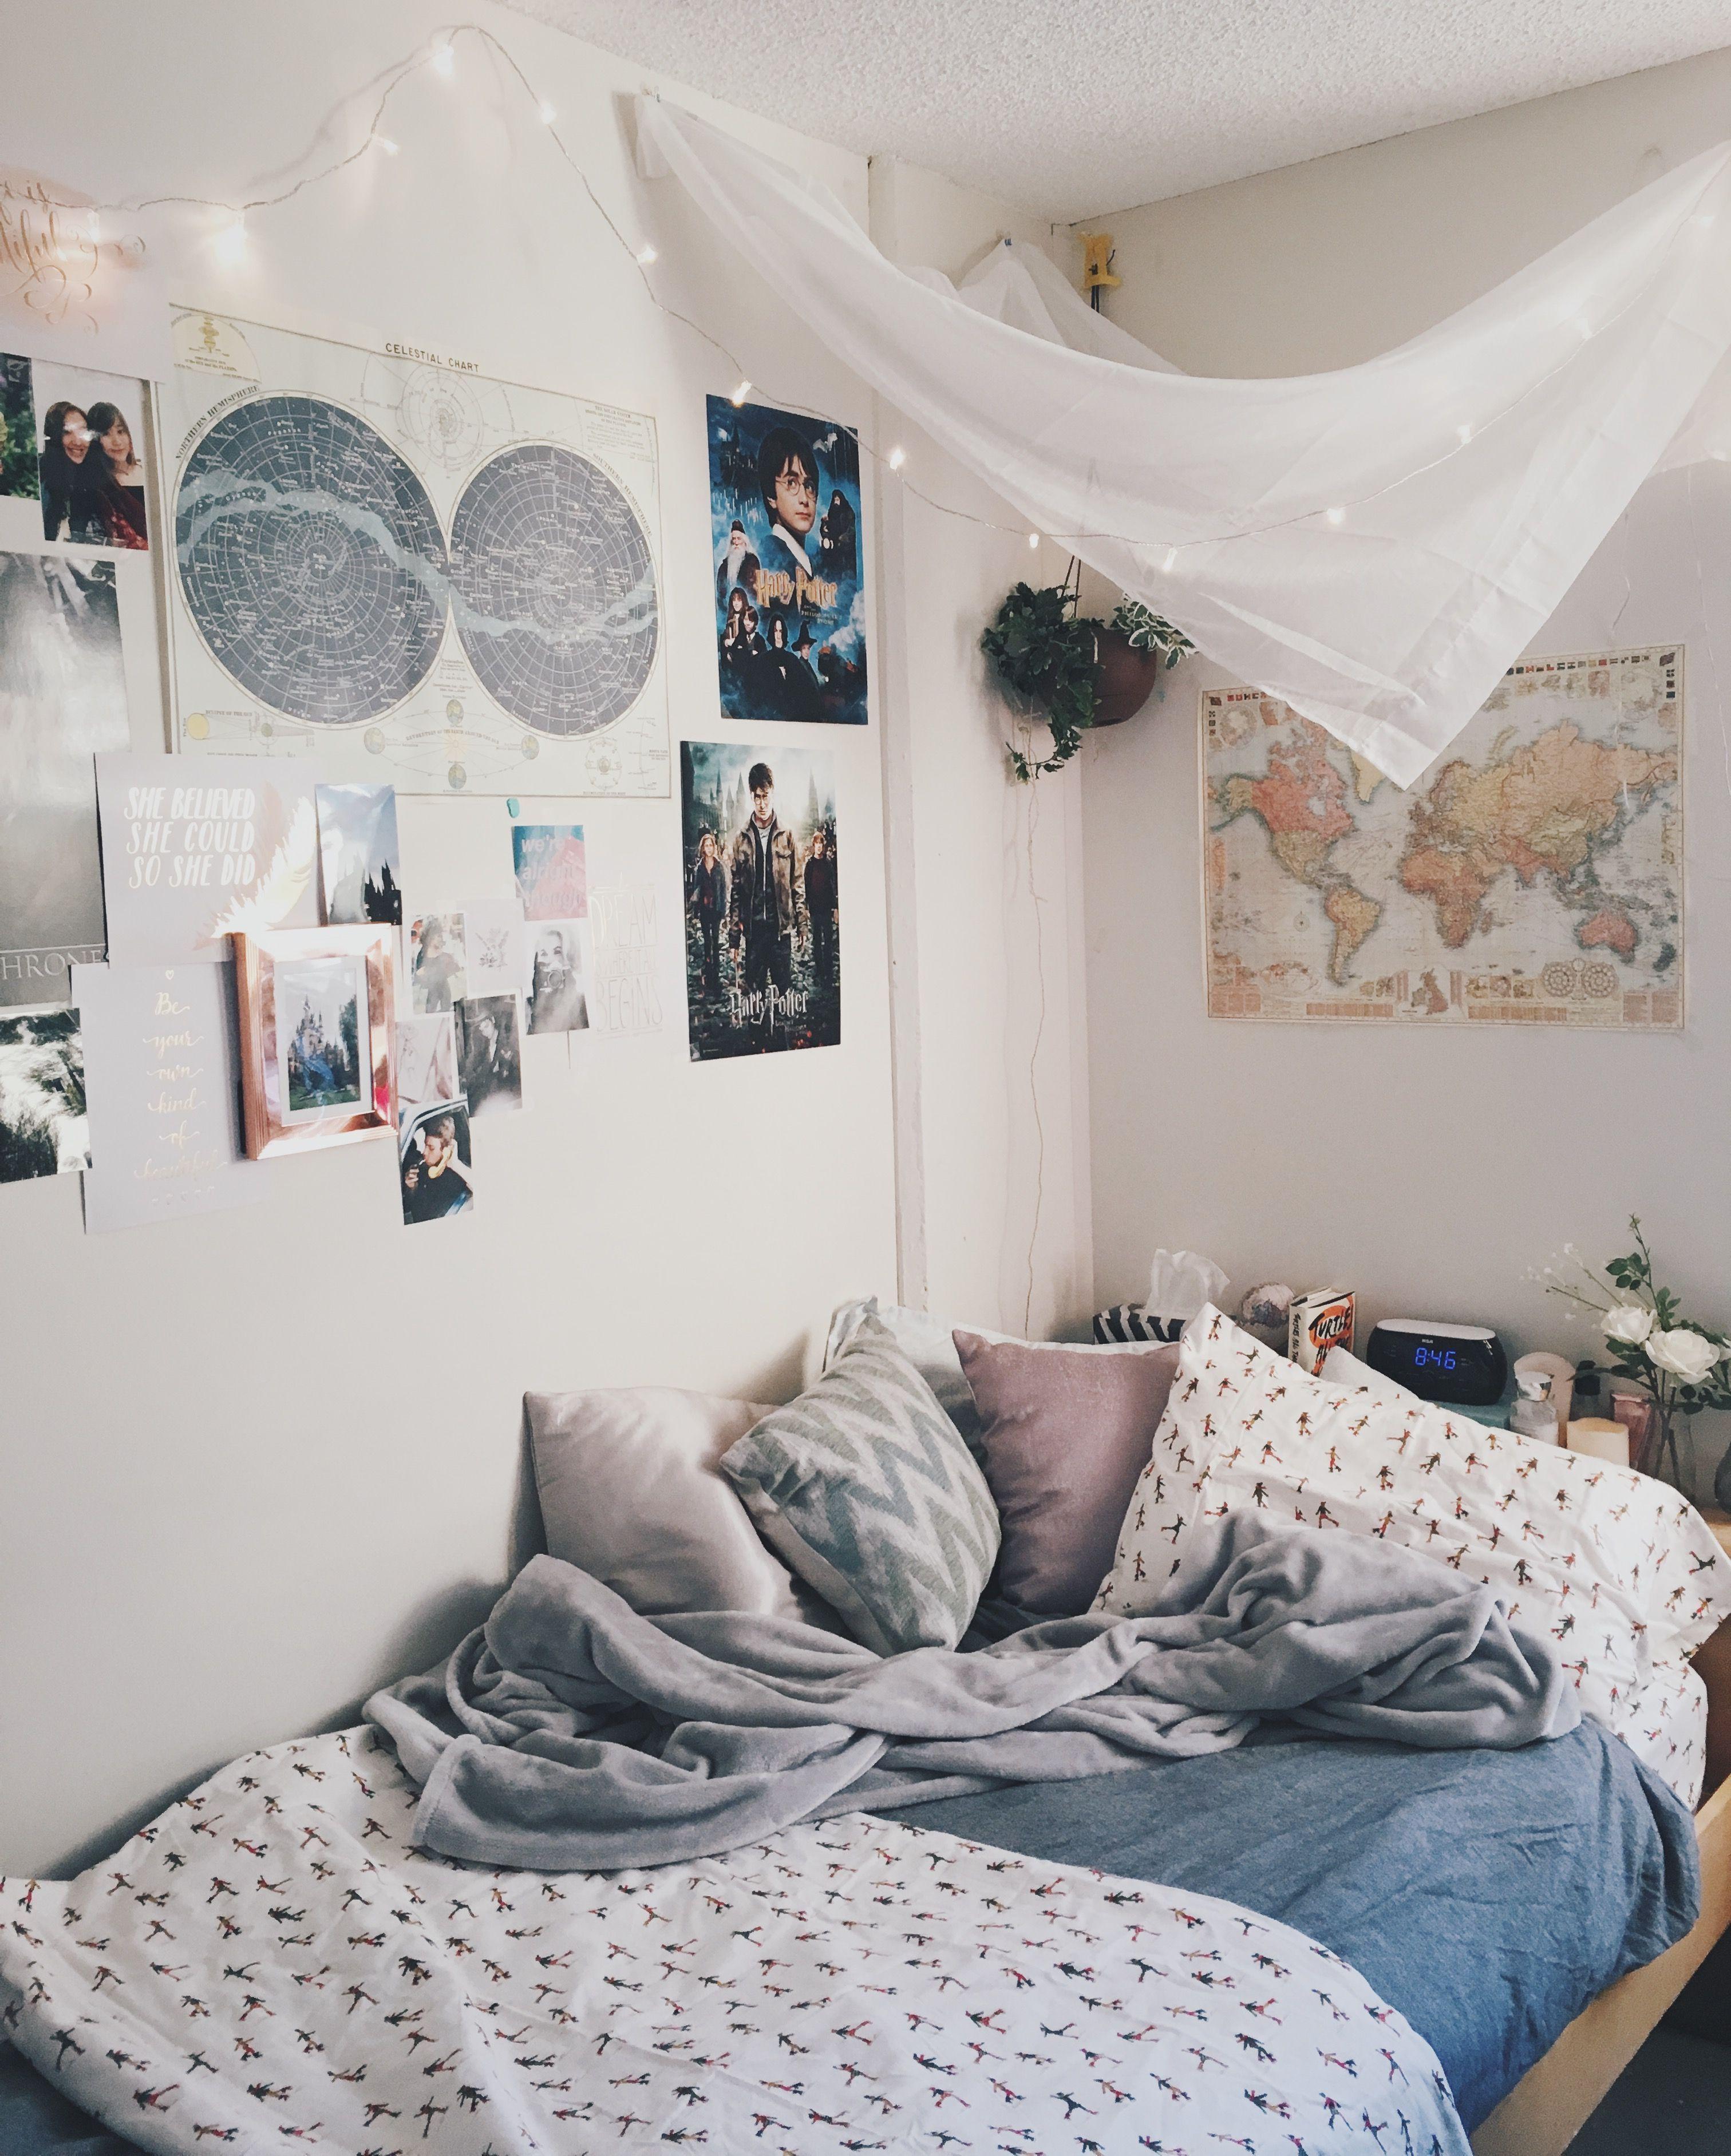 Pinterest // @alexandrahuffy ☼ ☾  Dorm room decor, Dorm room